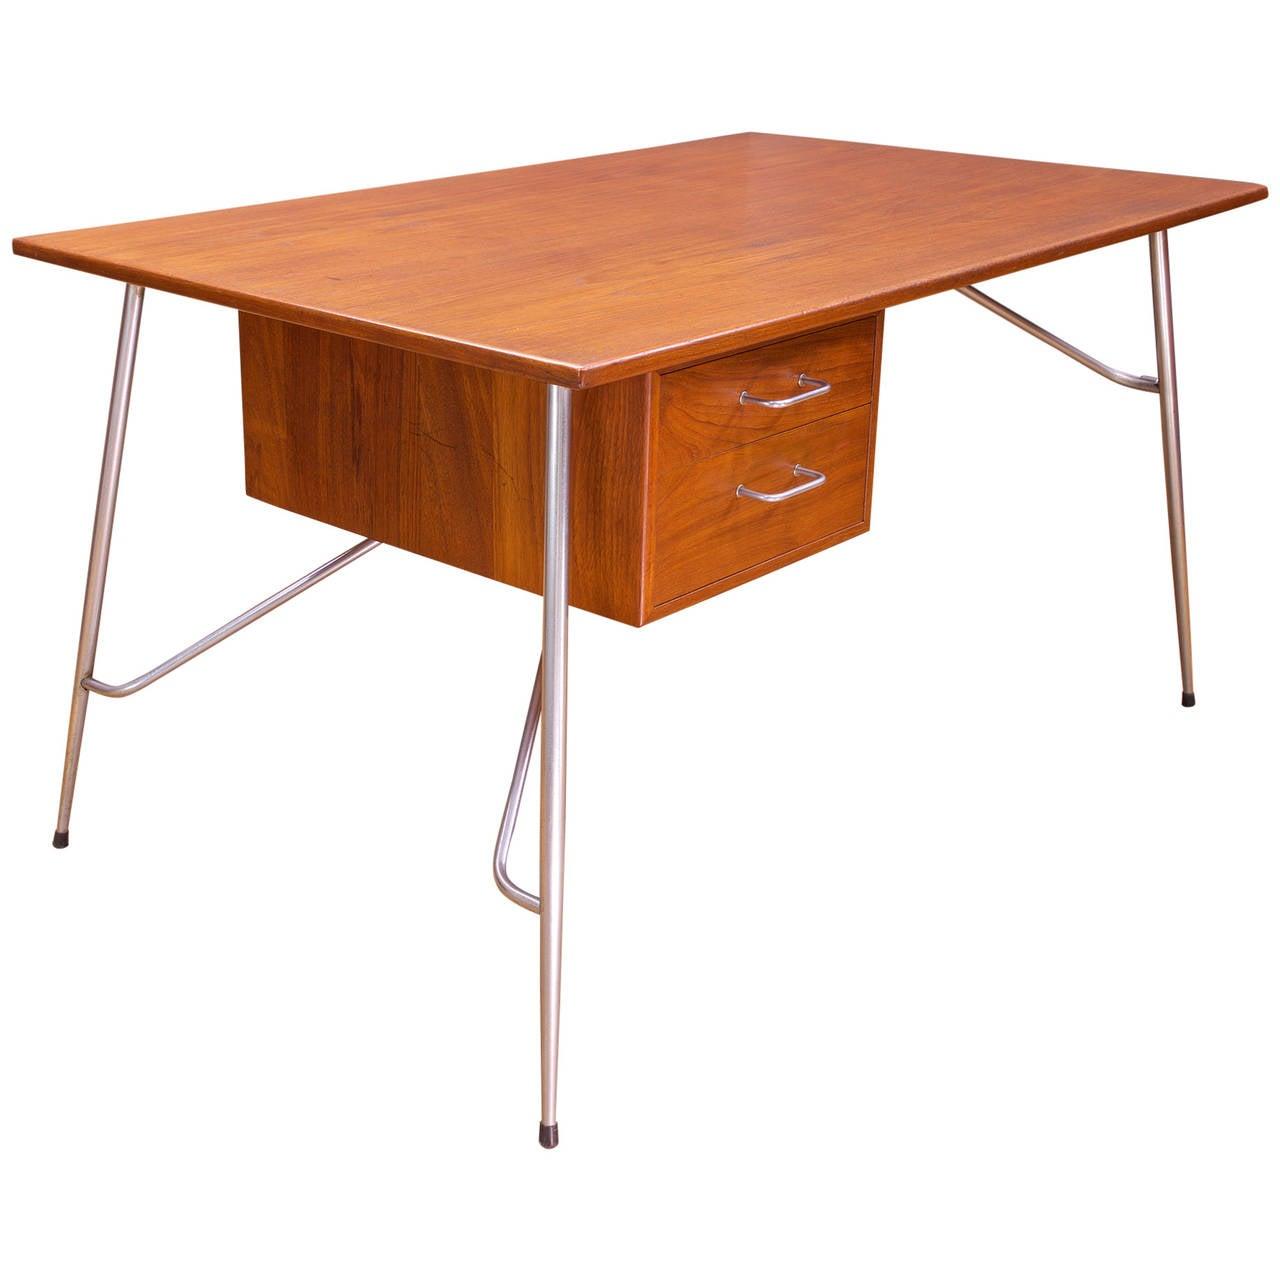 Rare Borge Mogensen Teak and Steel Desk Vintage Mid-Century Soborg Mobler For Sale